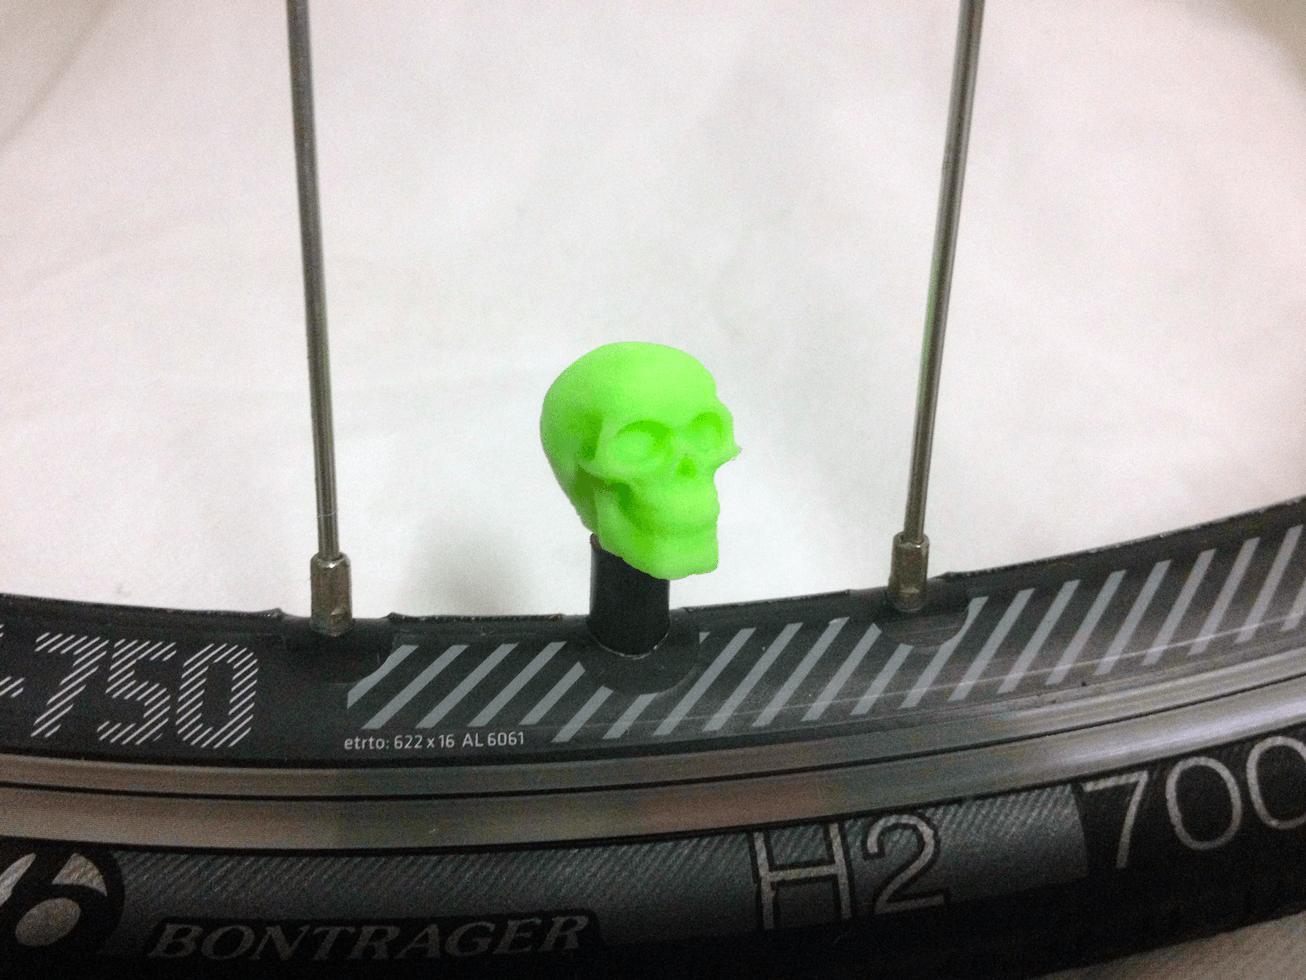 bike-skull-green.png Download STL file Skull Head Car Truck Bike Van Tire Tyre Wheel Valve Stem Caps Cover • Template to 3D print, Custom3DPrinting